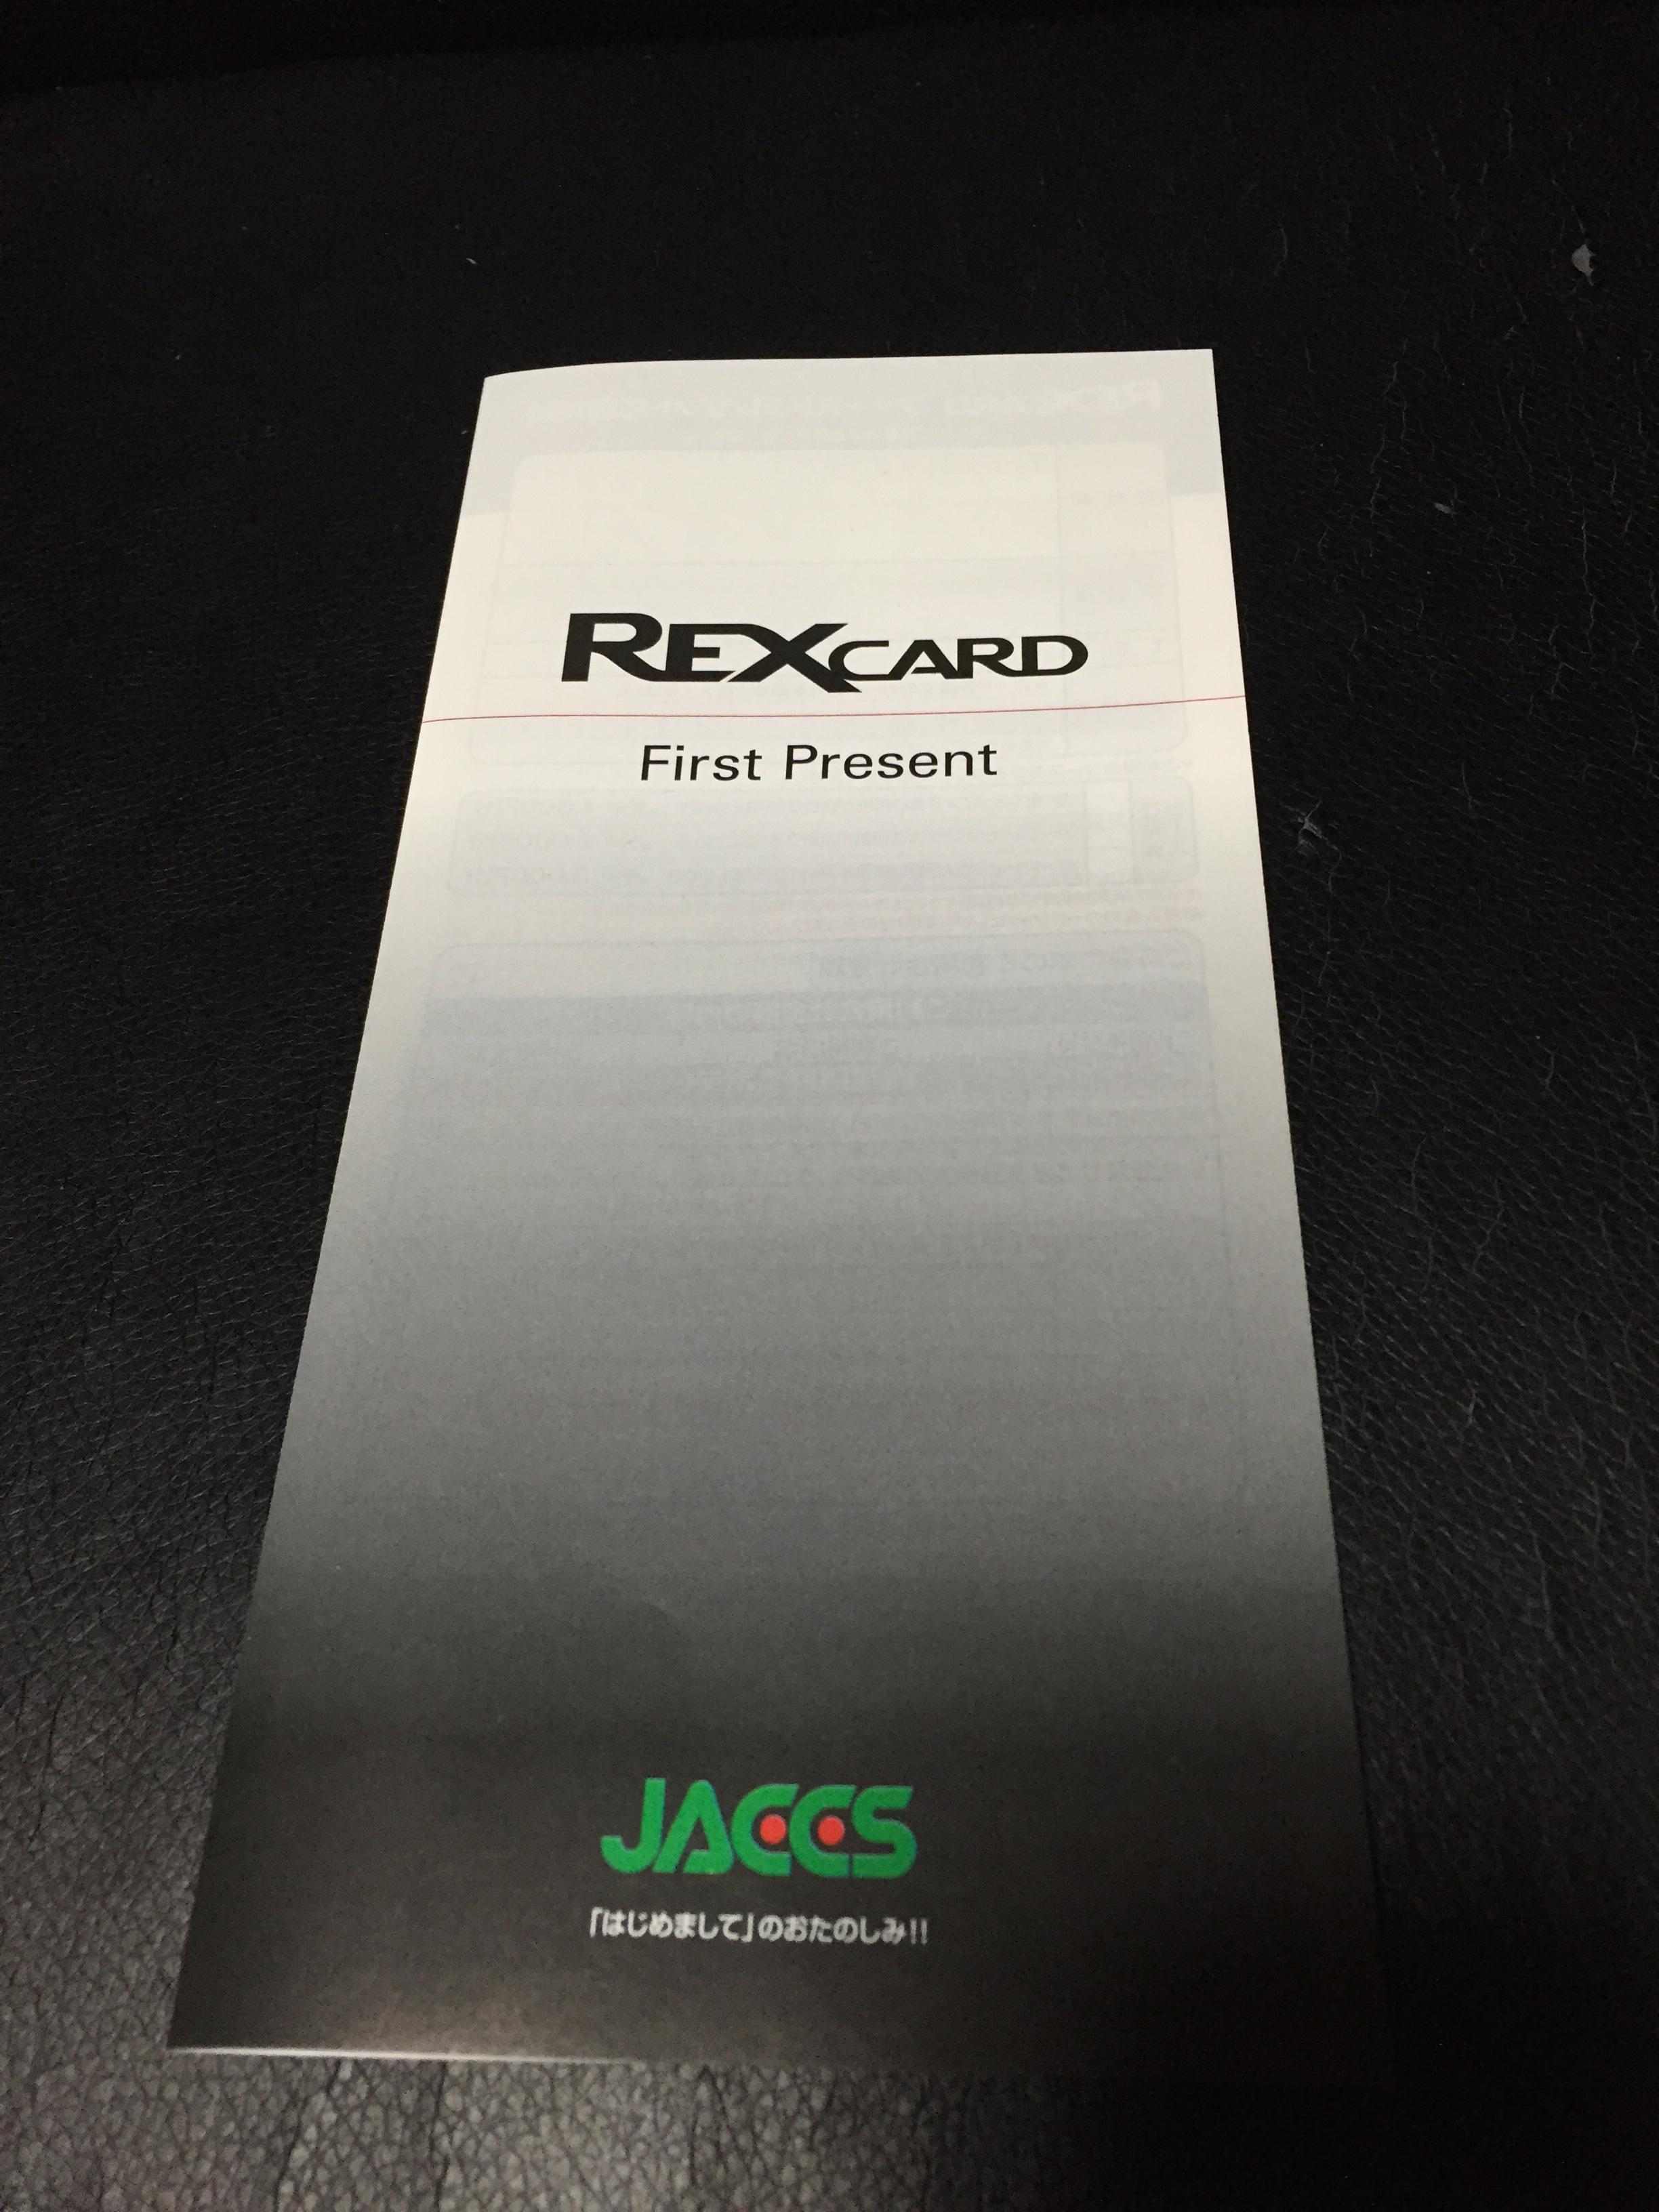 REX CARDにログインしてファーストプレゼントをしっかりゲットしよう!!申し込み方法は??